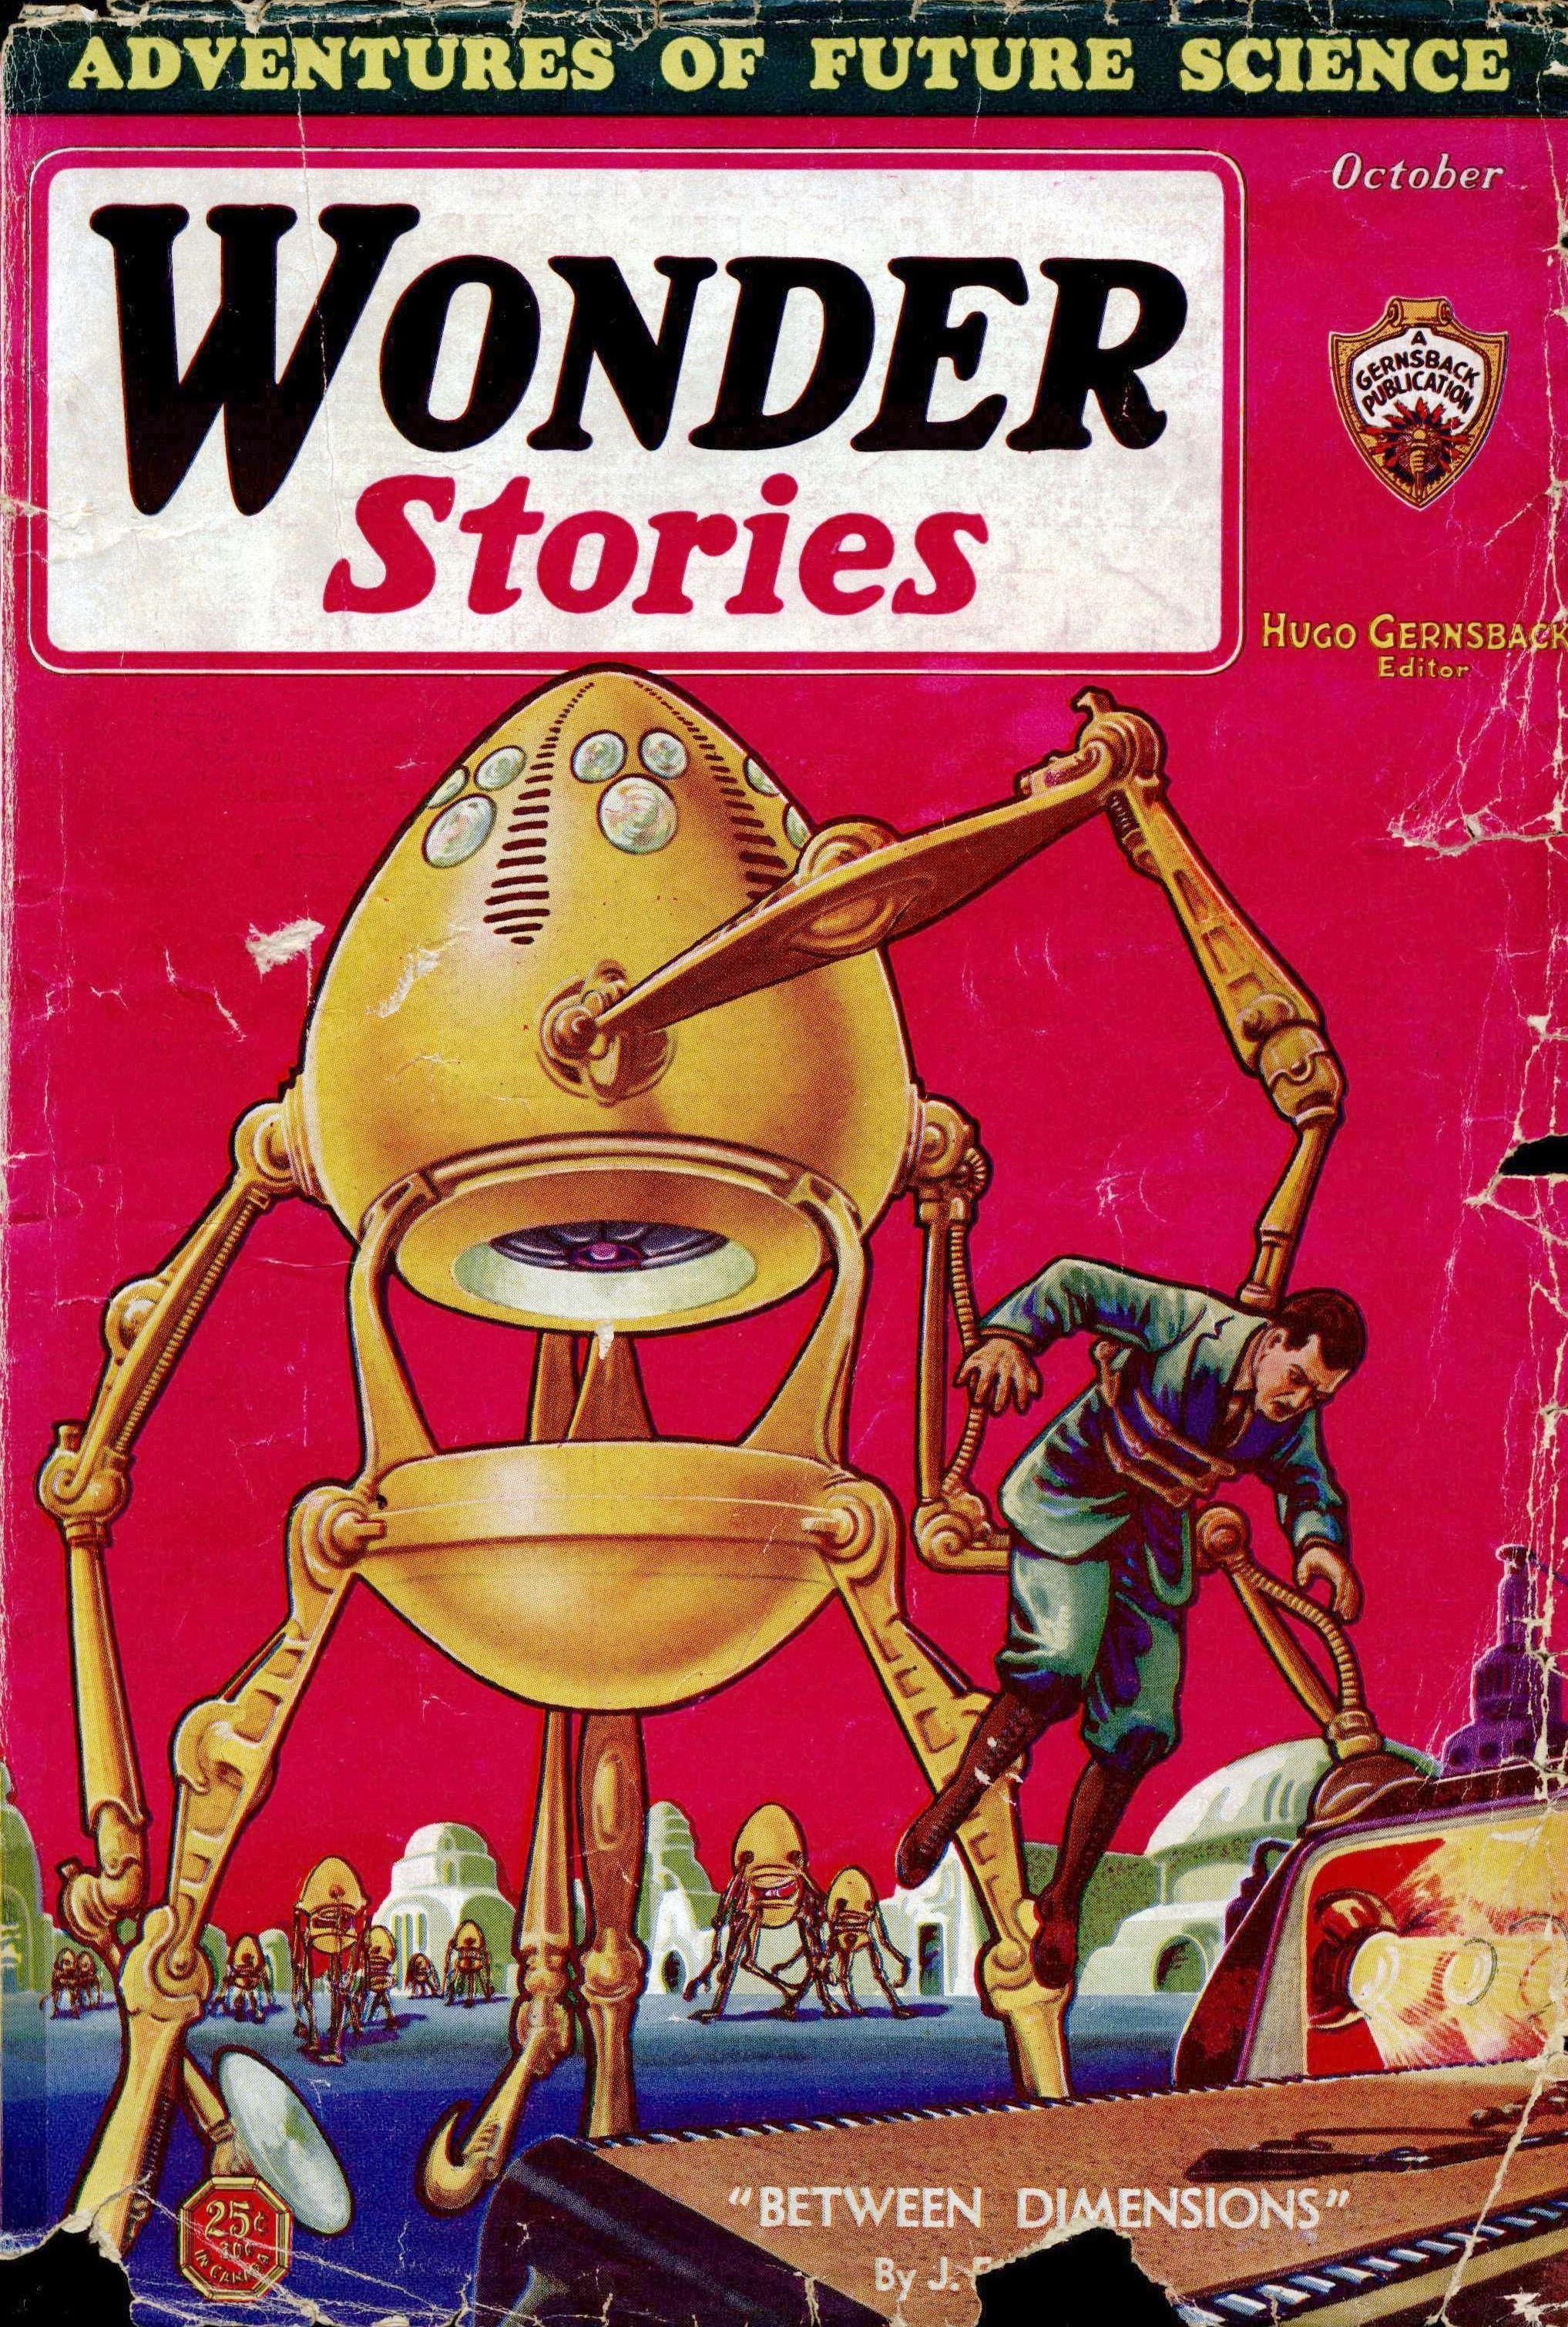 Wonder Stories, October 1931